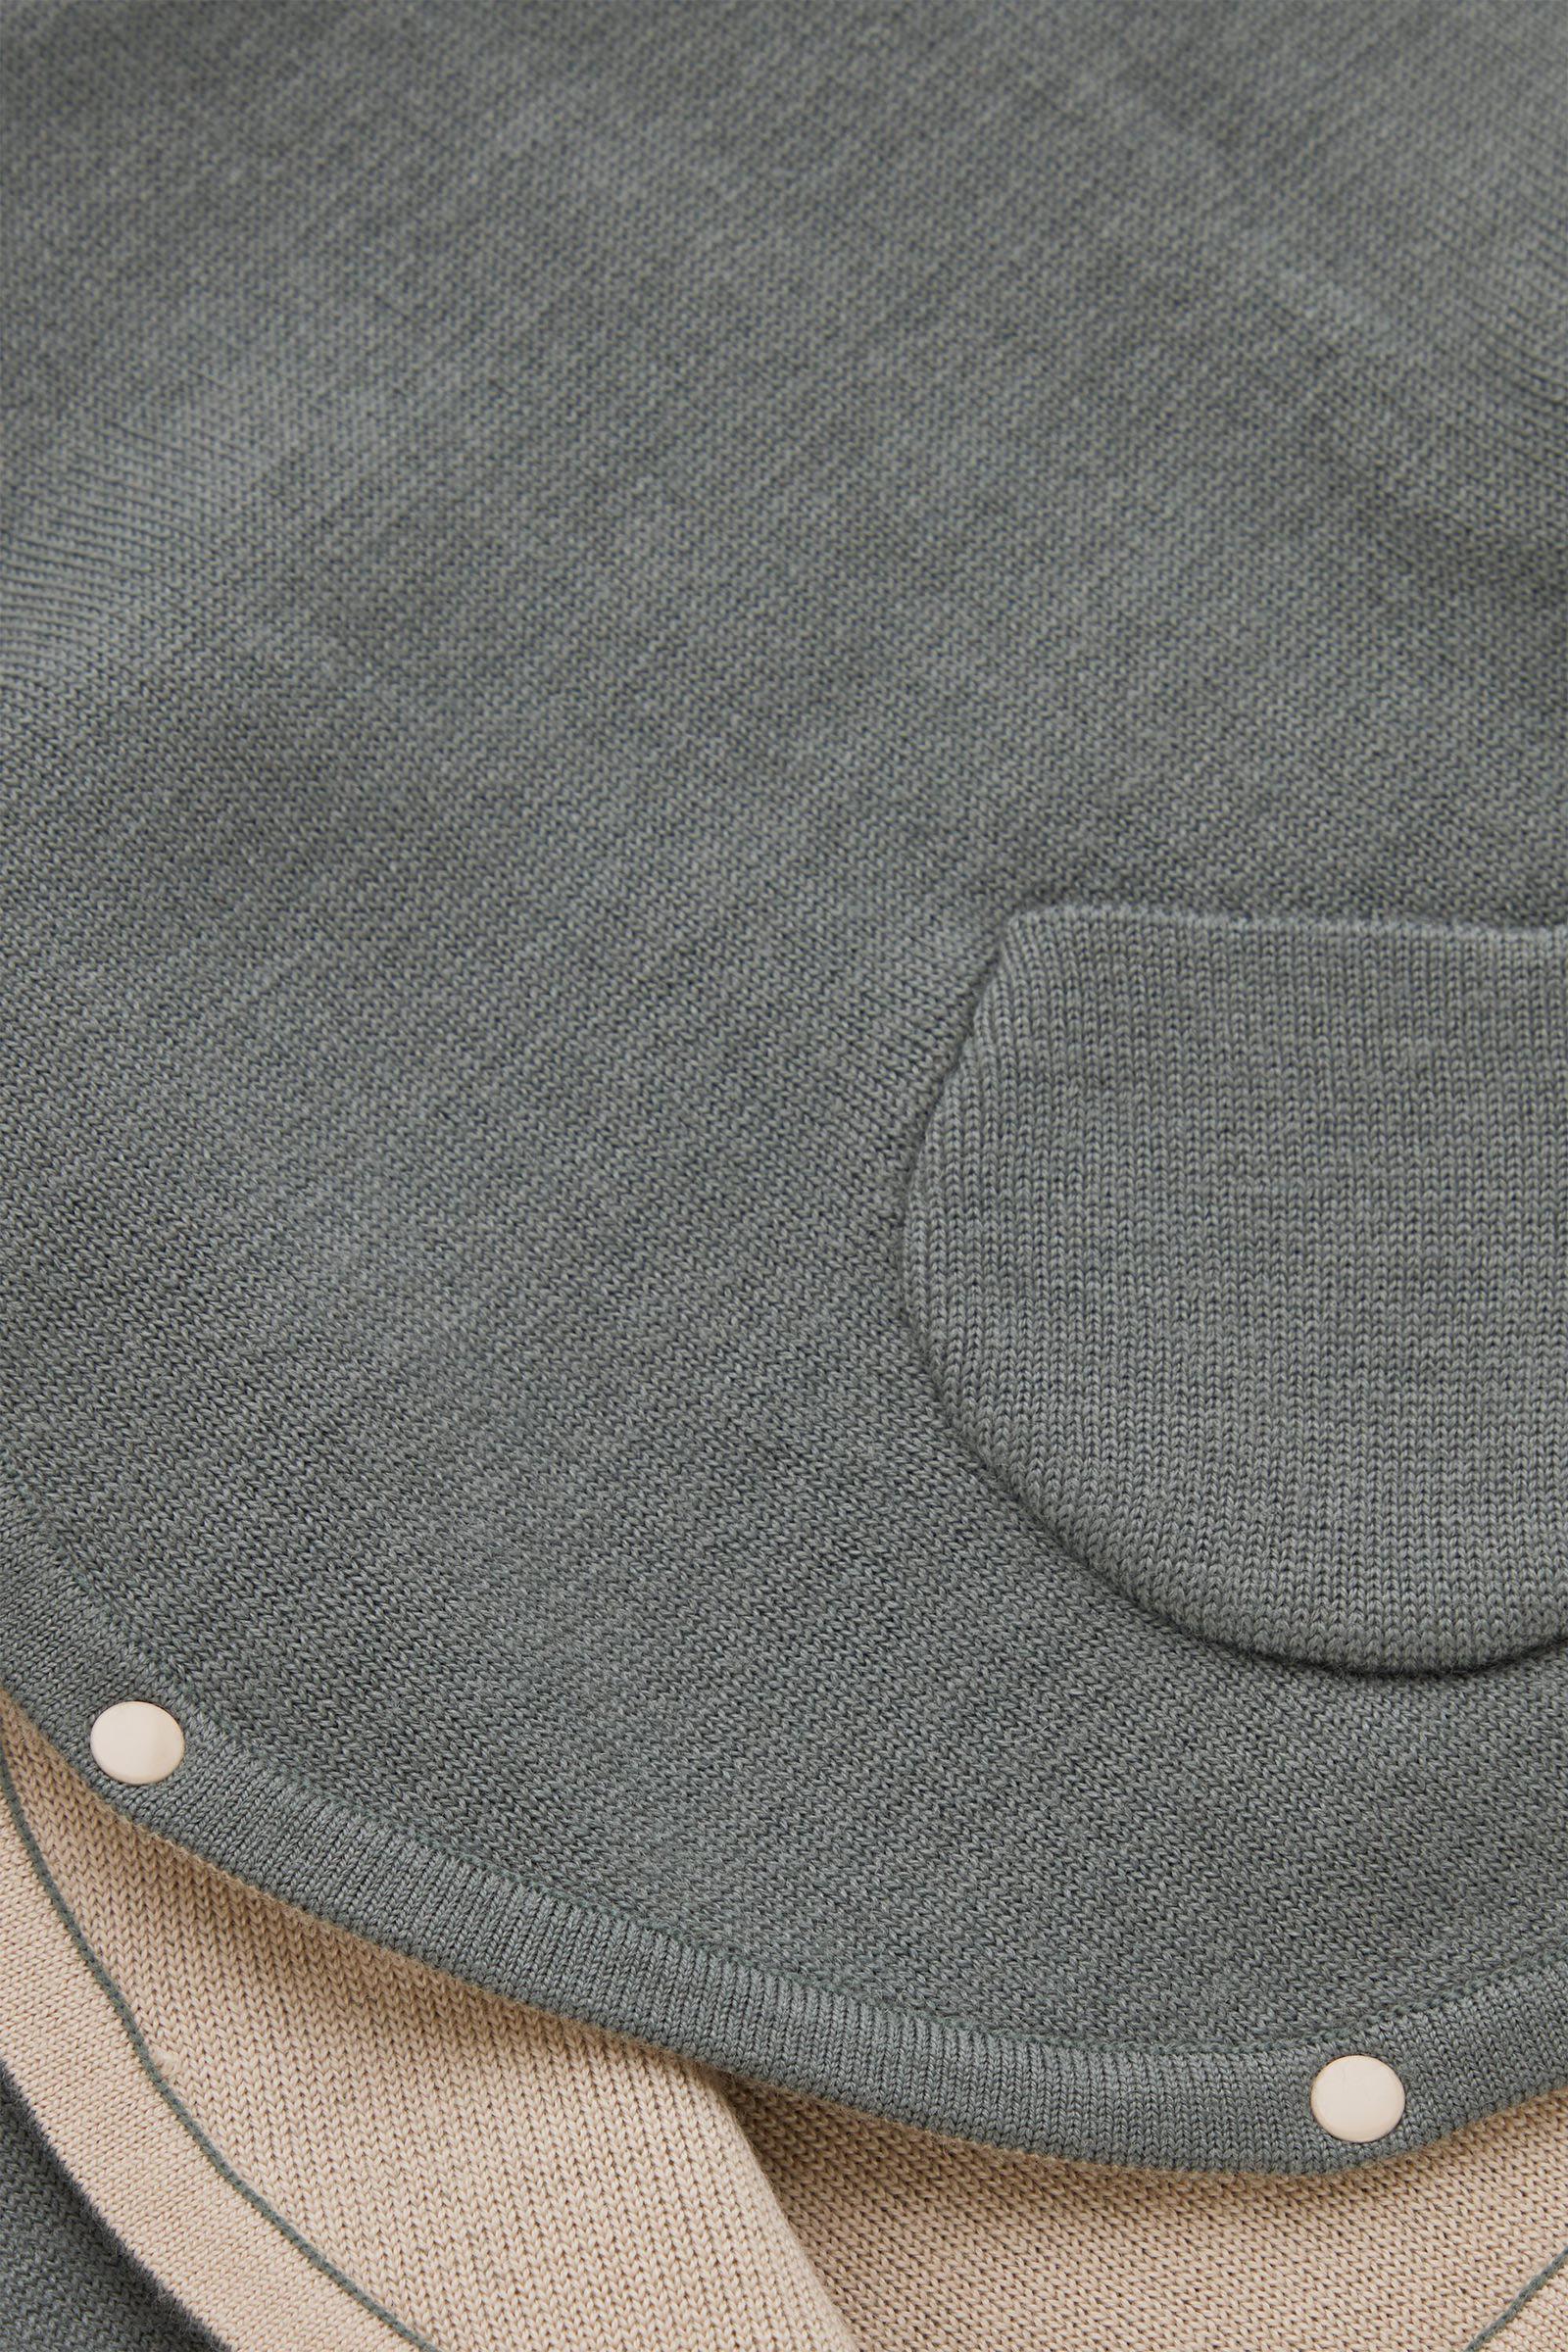 COS 울 니티드 가디건의 그린 / 베이지컬러 Detail입니다.